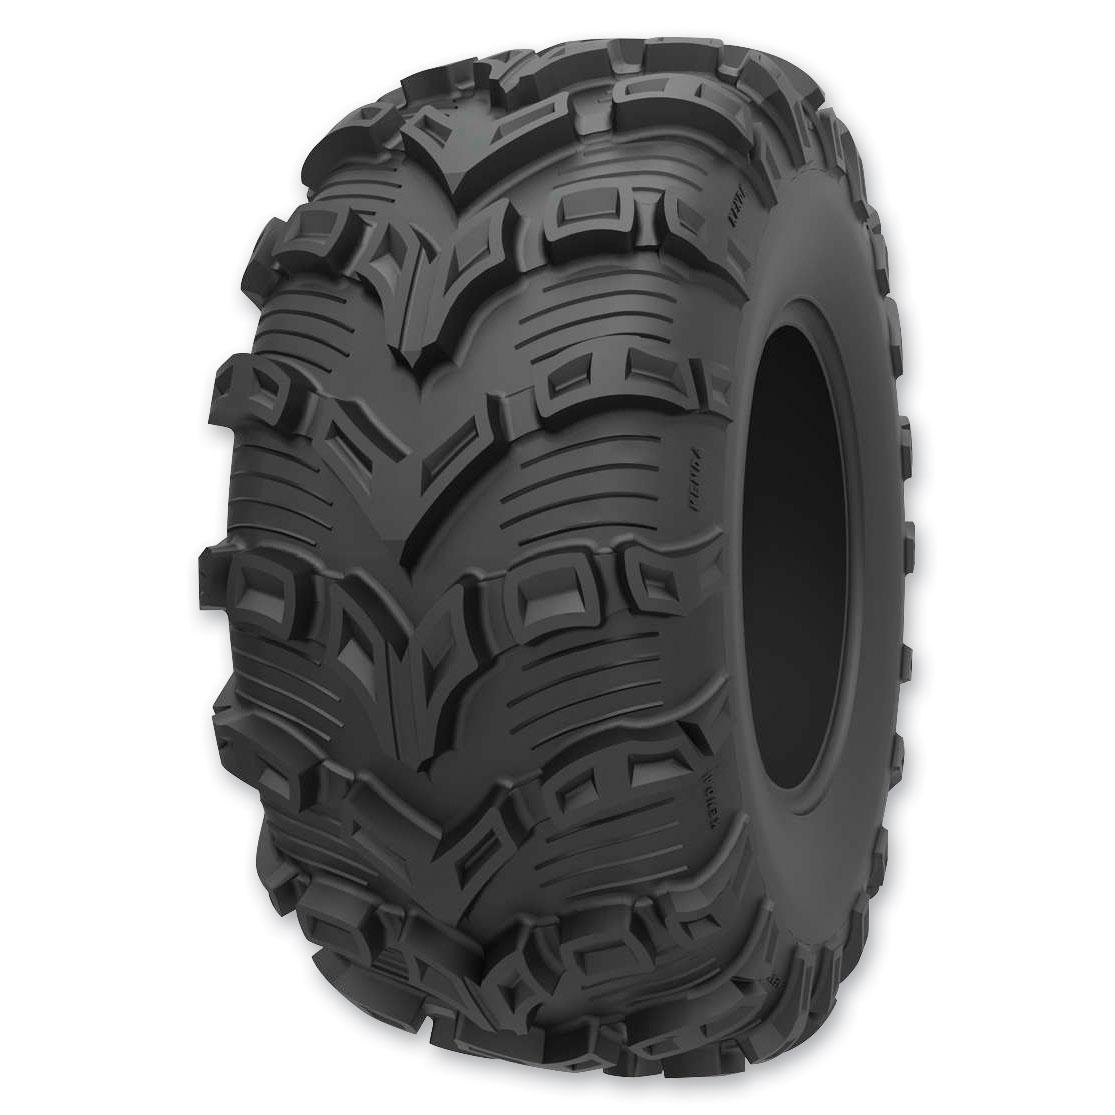 Kenda Tires K592 Bearclaw 26X9X12 Front Tire